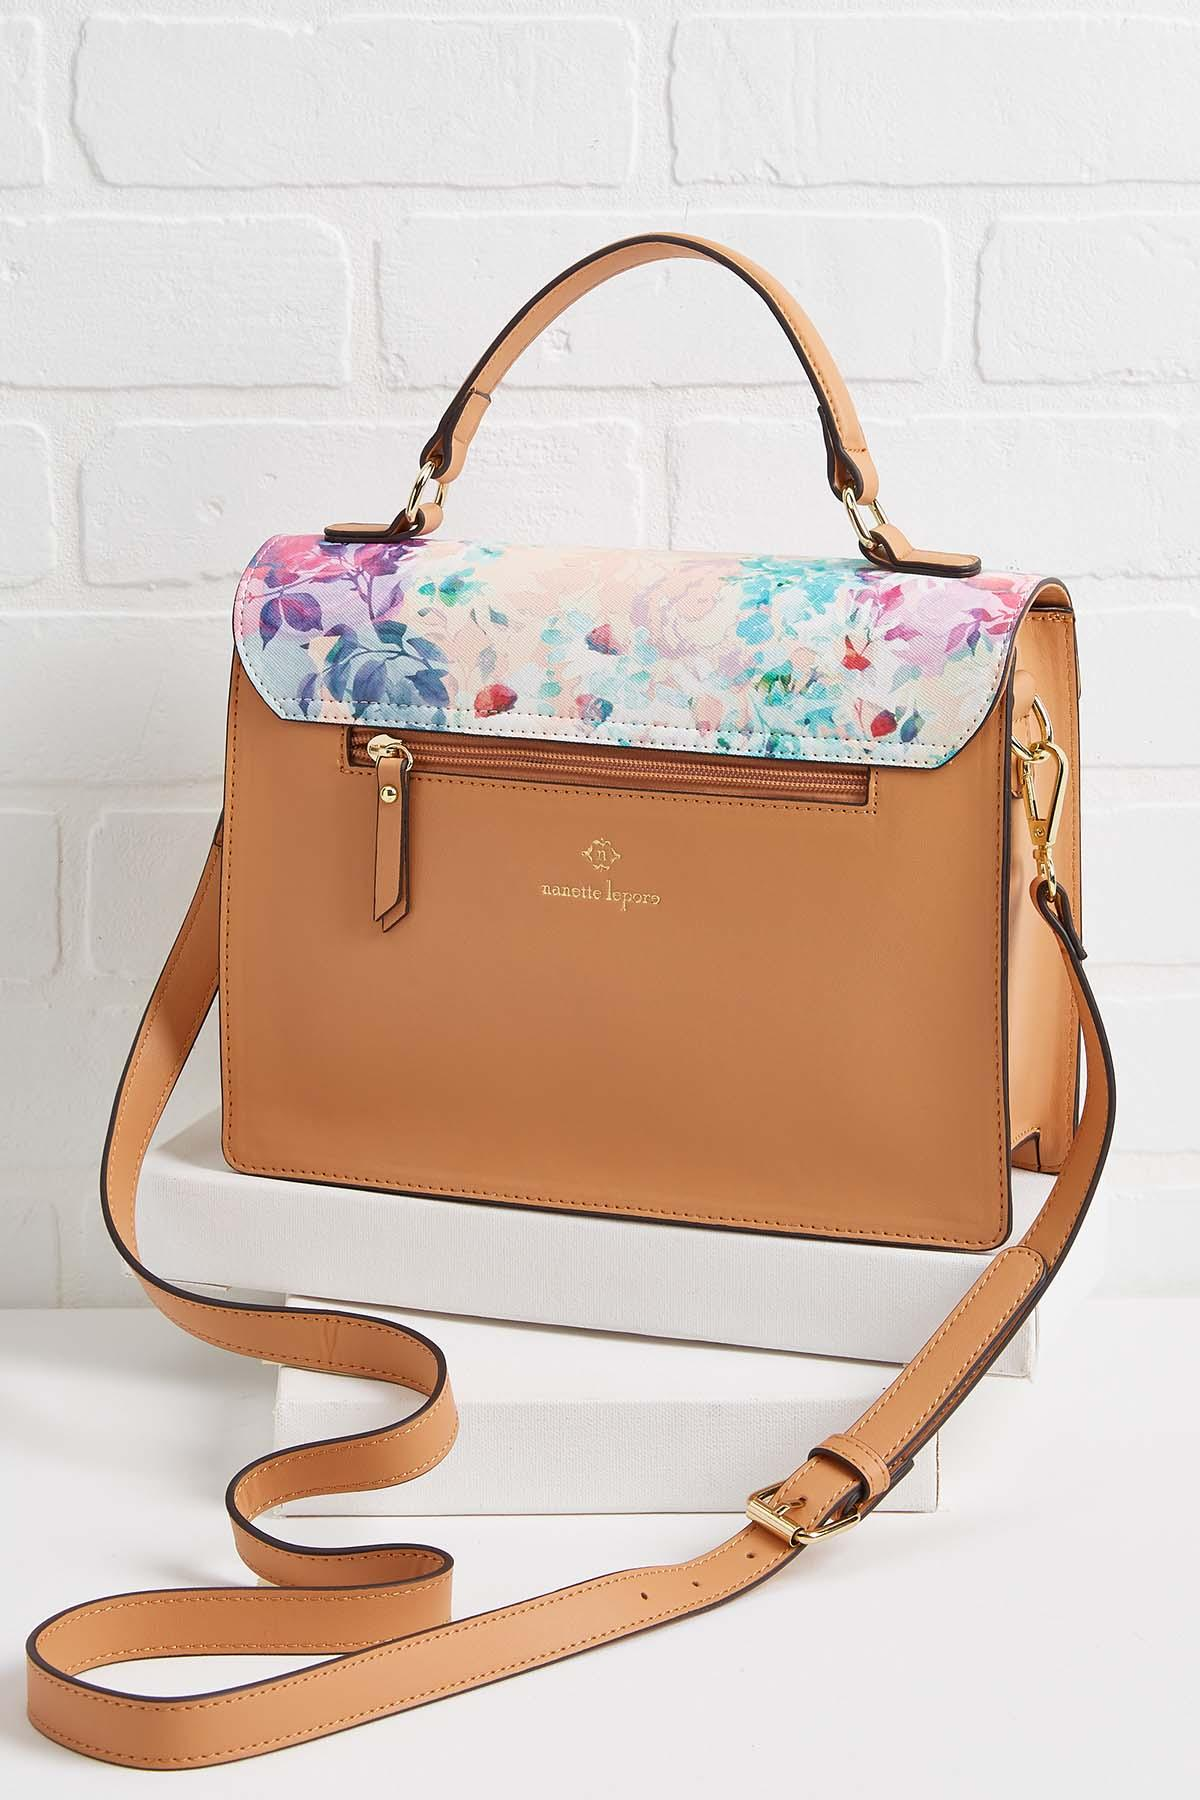 Carry The Bouquet Bag